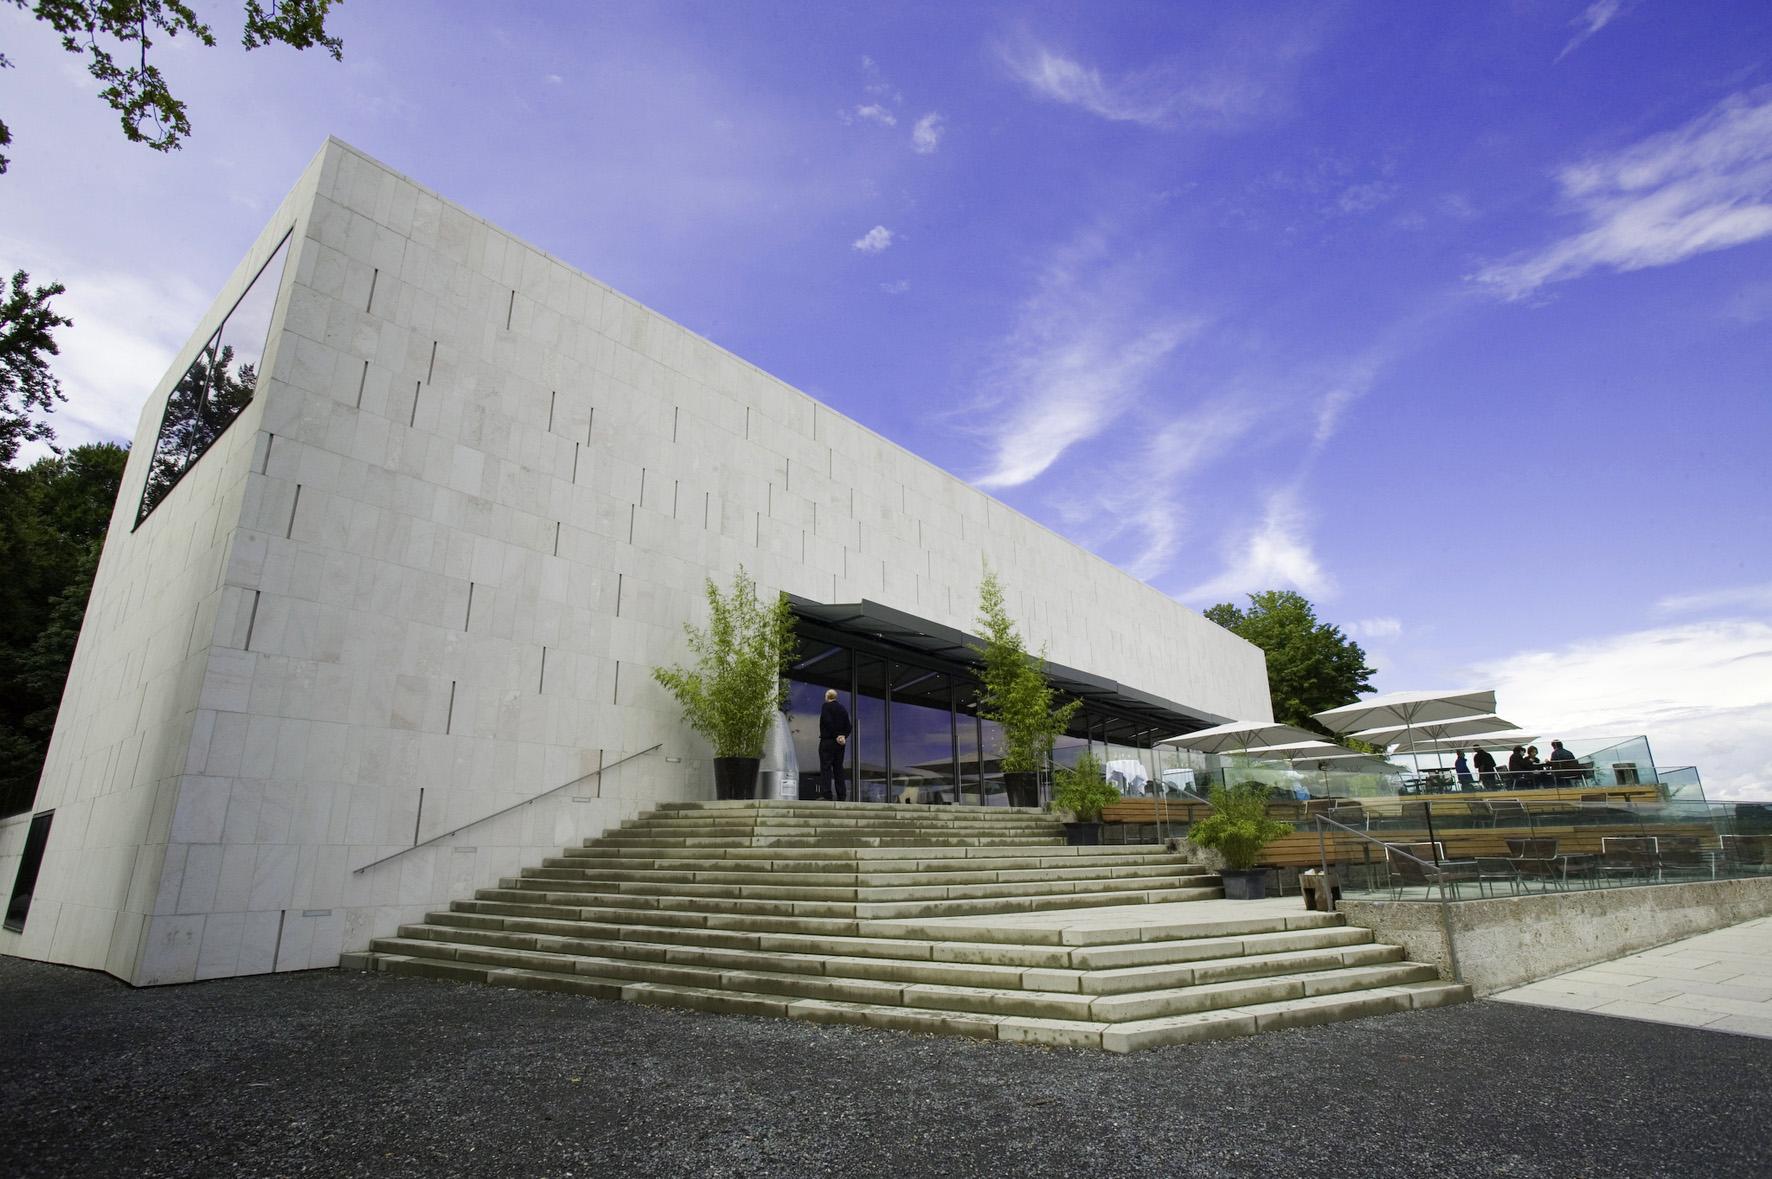 salzburg-muzej-der-moderne-na-mon-dsberg-secret-world